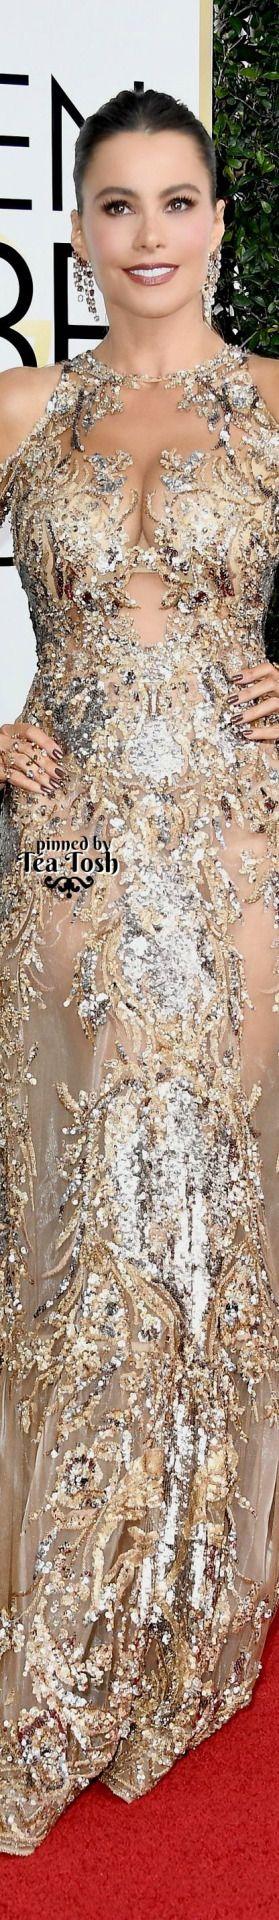 ❇Téa Tosh❇ Sofia Vergara, wearing a Zuhair Murad Couture dress with Lorraine Schwartz jewels. jαɢlαdy